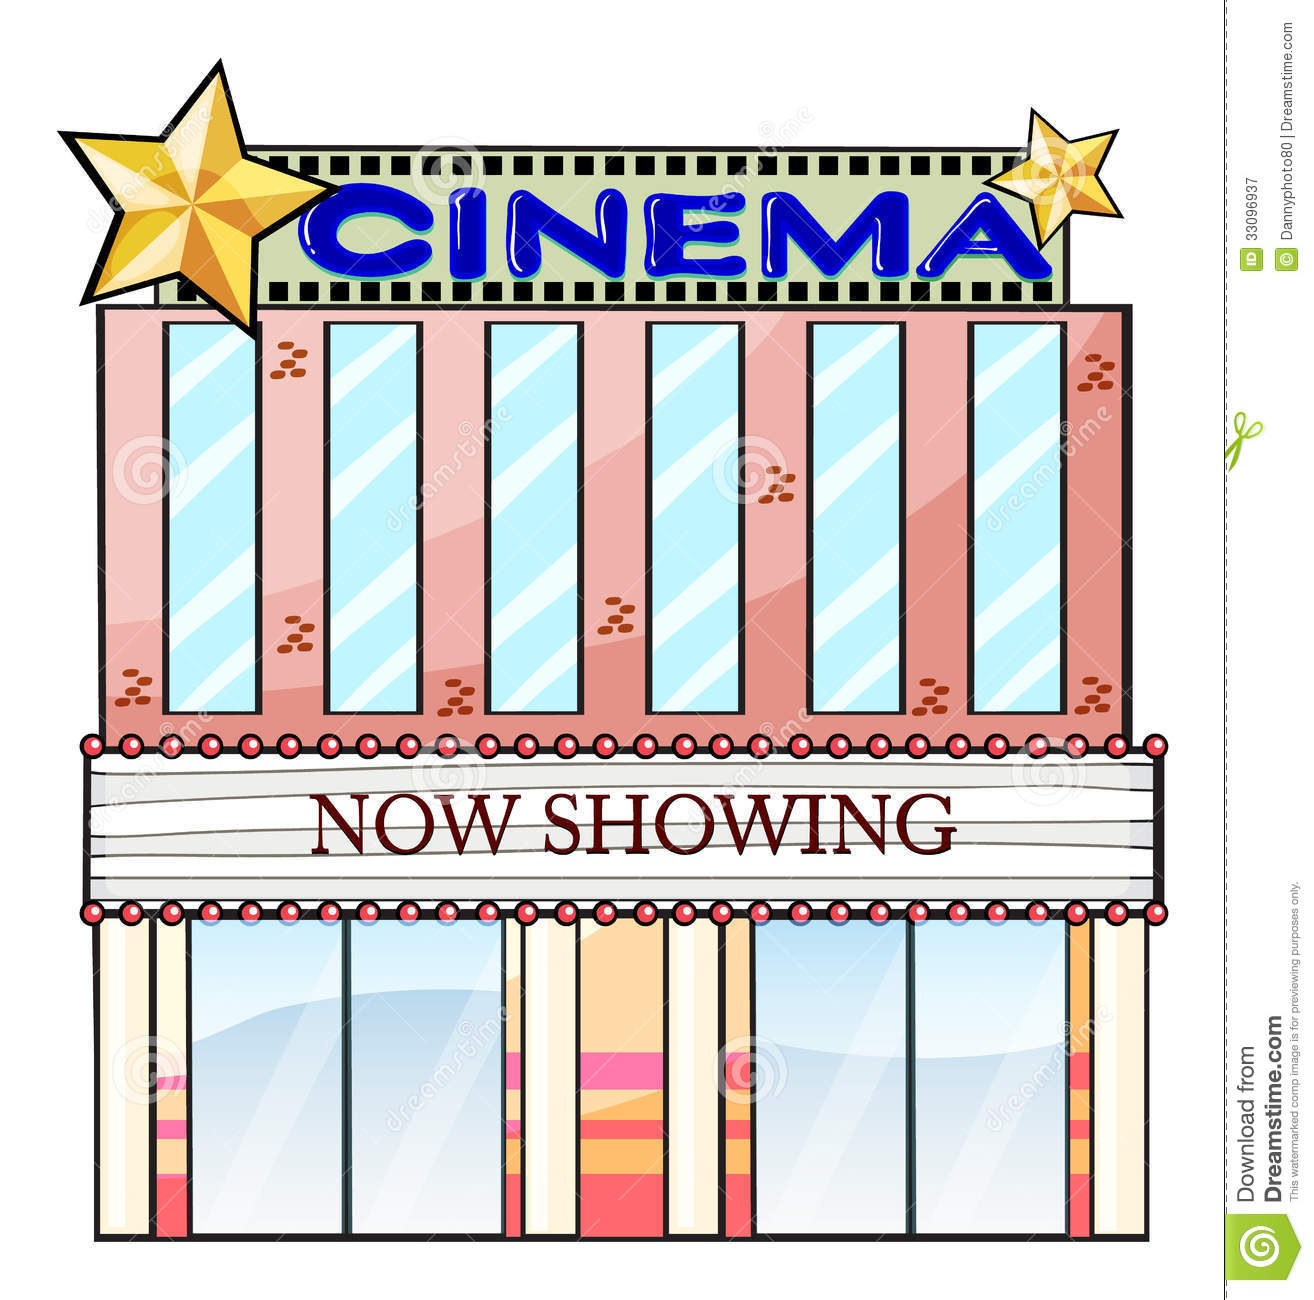 clipart movies cinema - photo #19